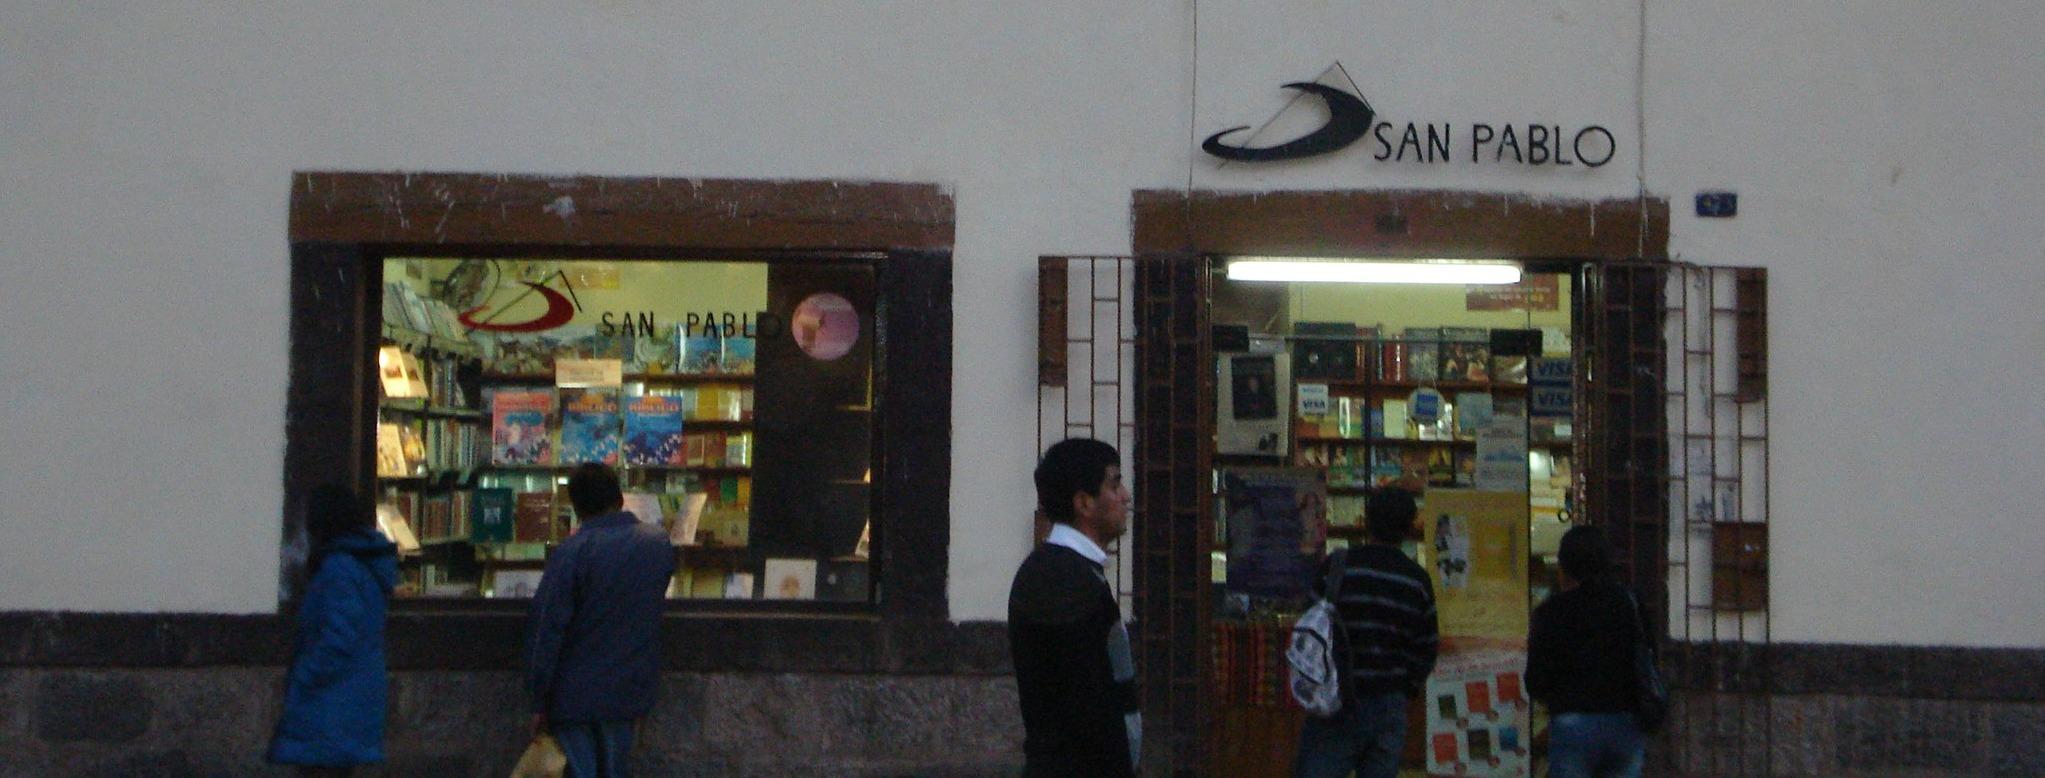 Portada Librería San Pablo Cusco